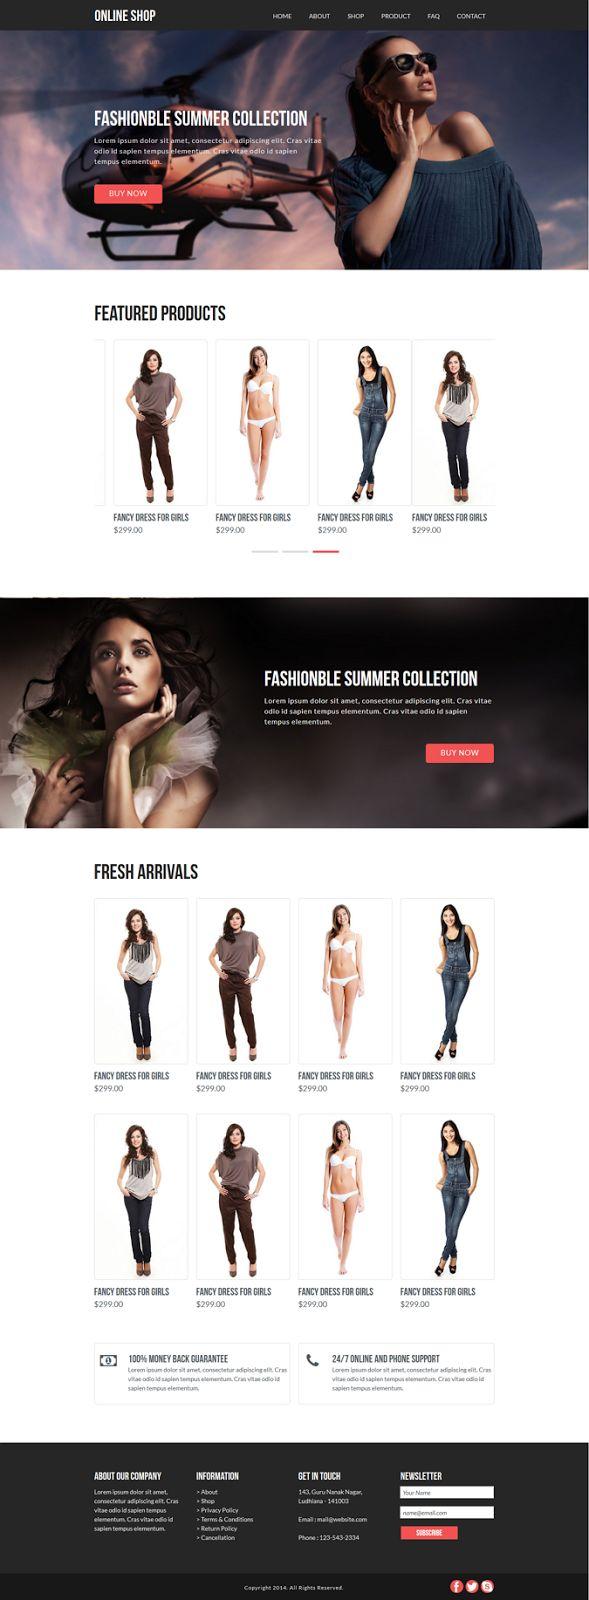 Best eCommerce Muse Template #webdesign #shopping #adobe